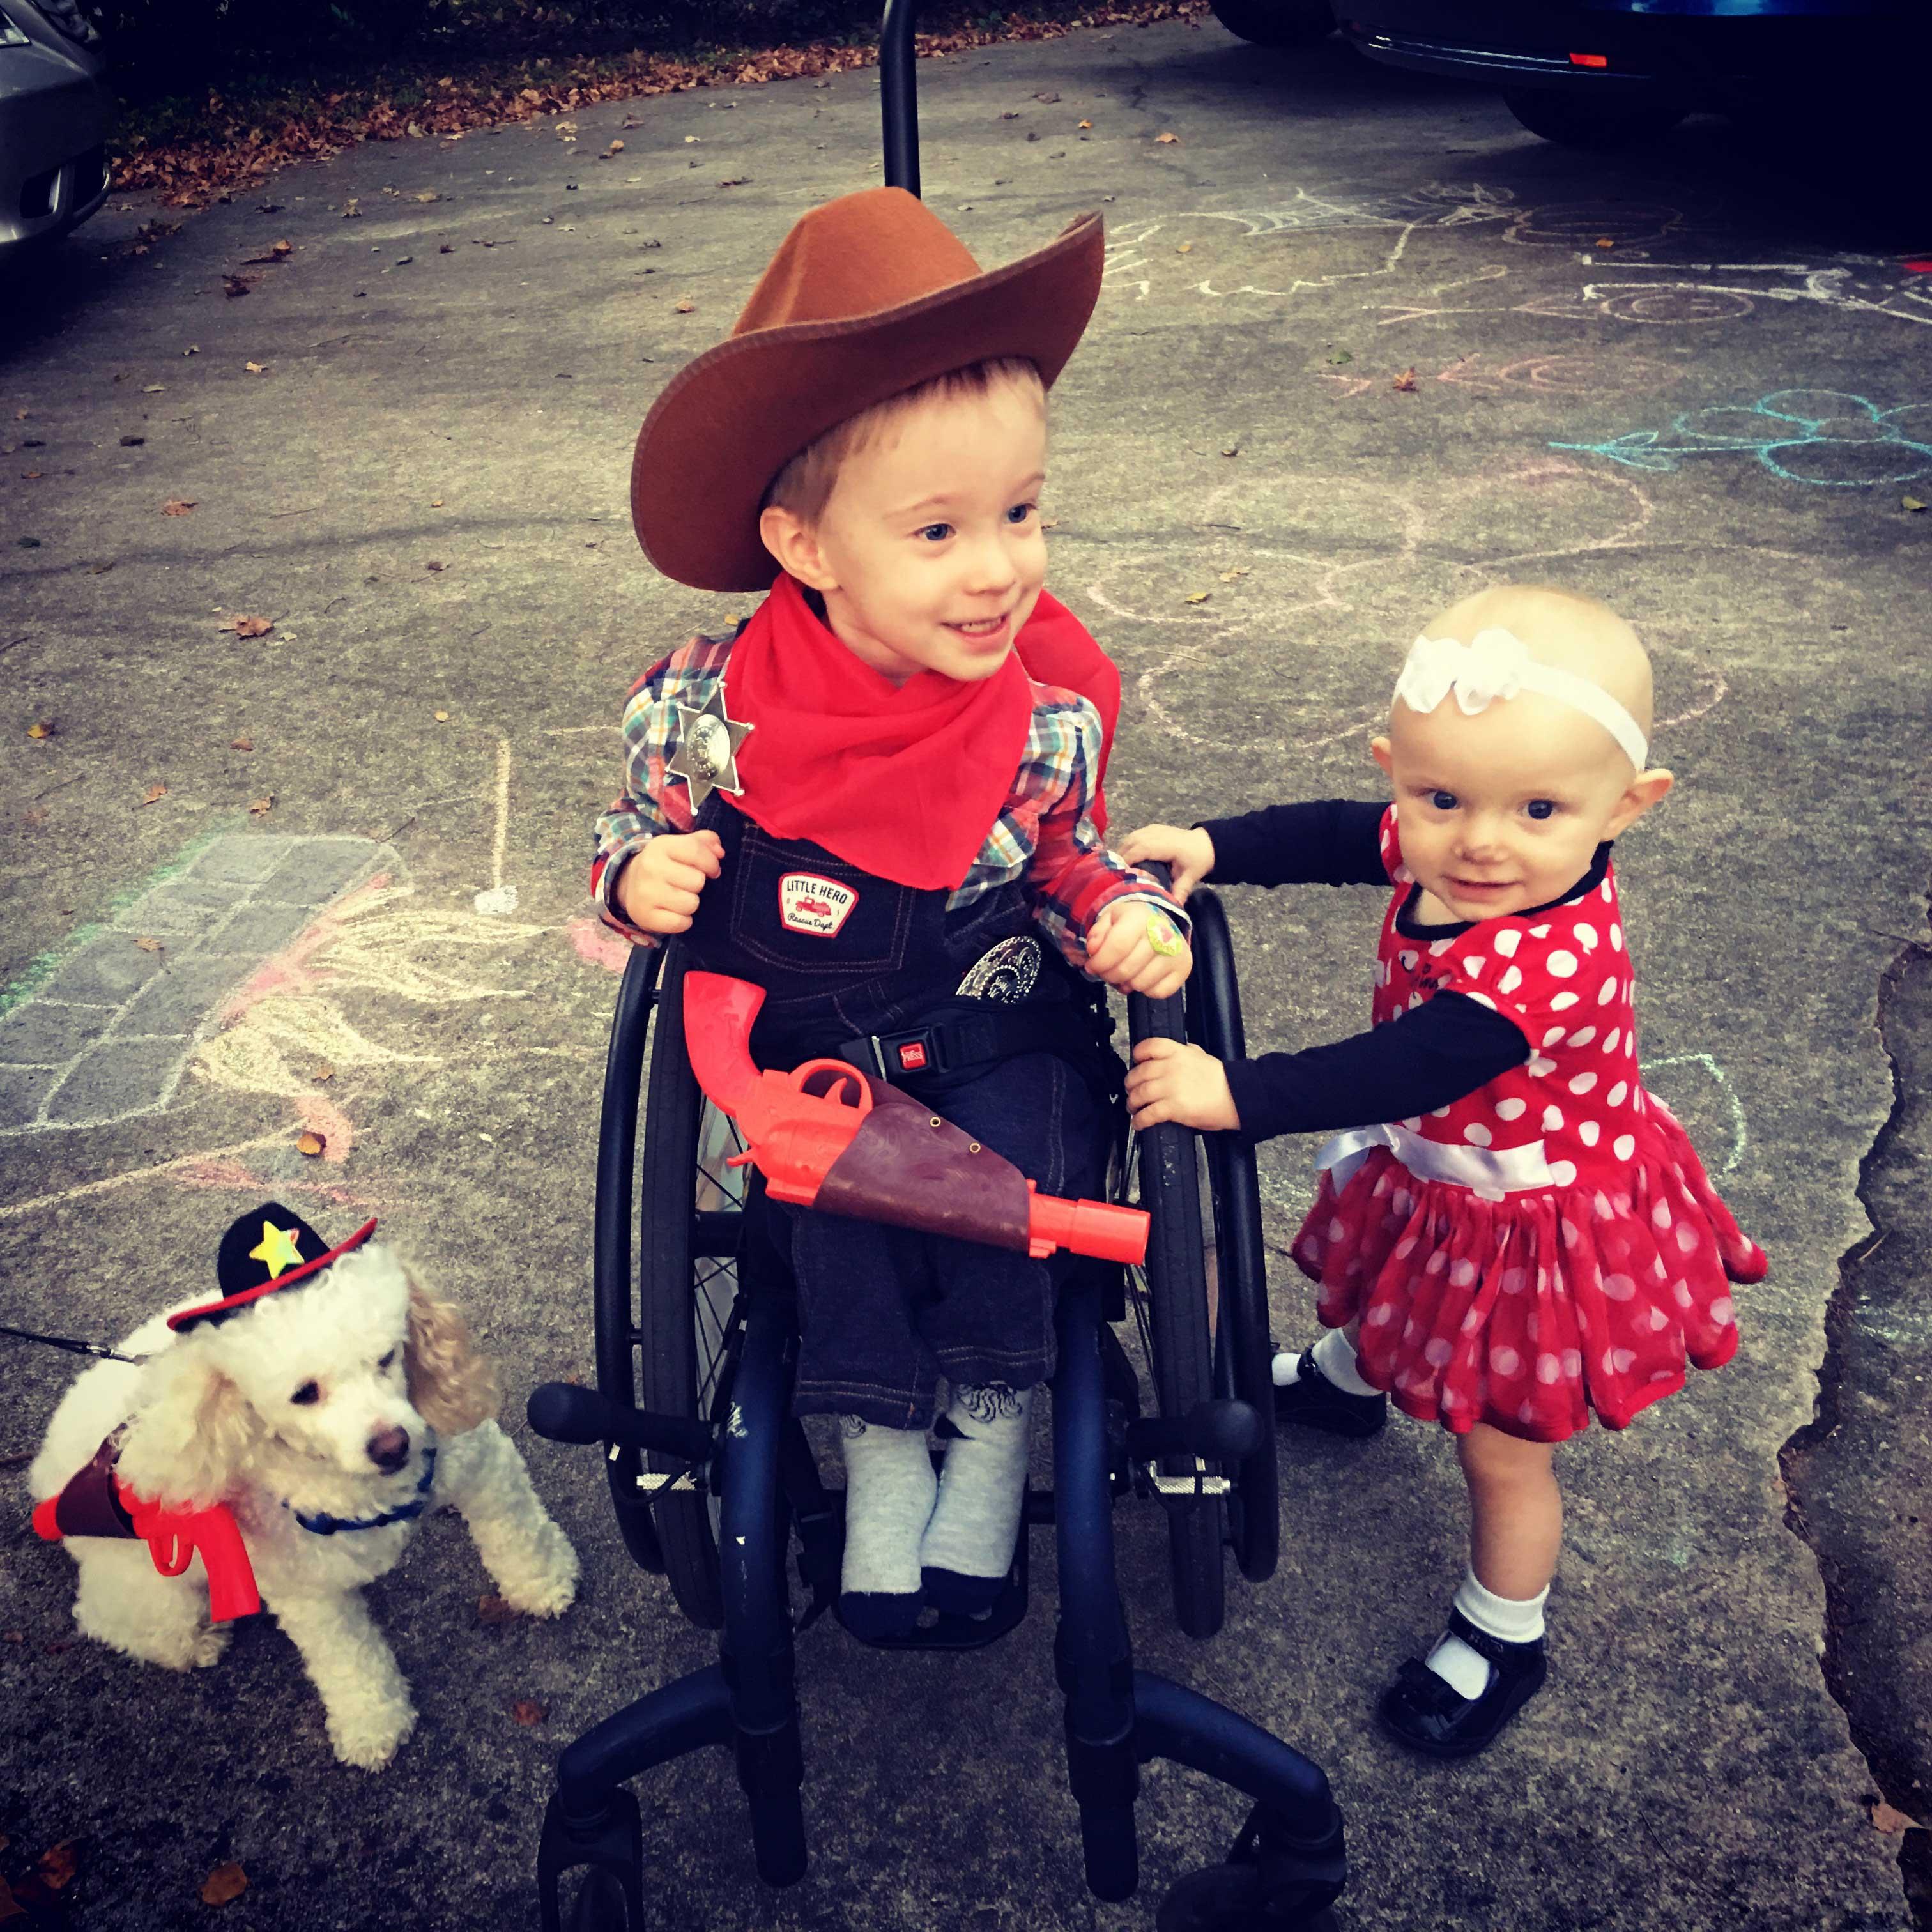 Montgomery Weer, left, and his sister, Evangeline. (Photo: Marjorie Weer)